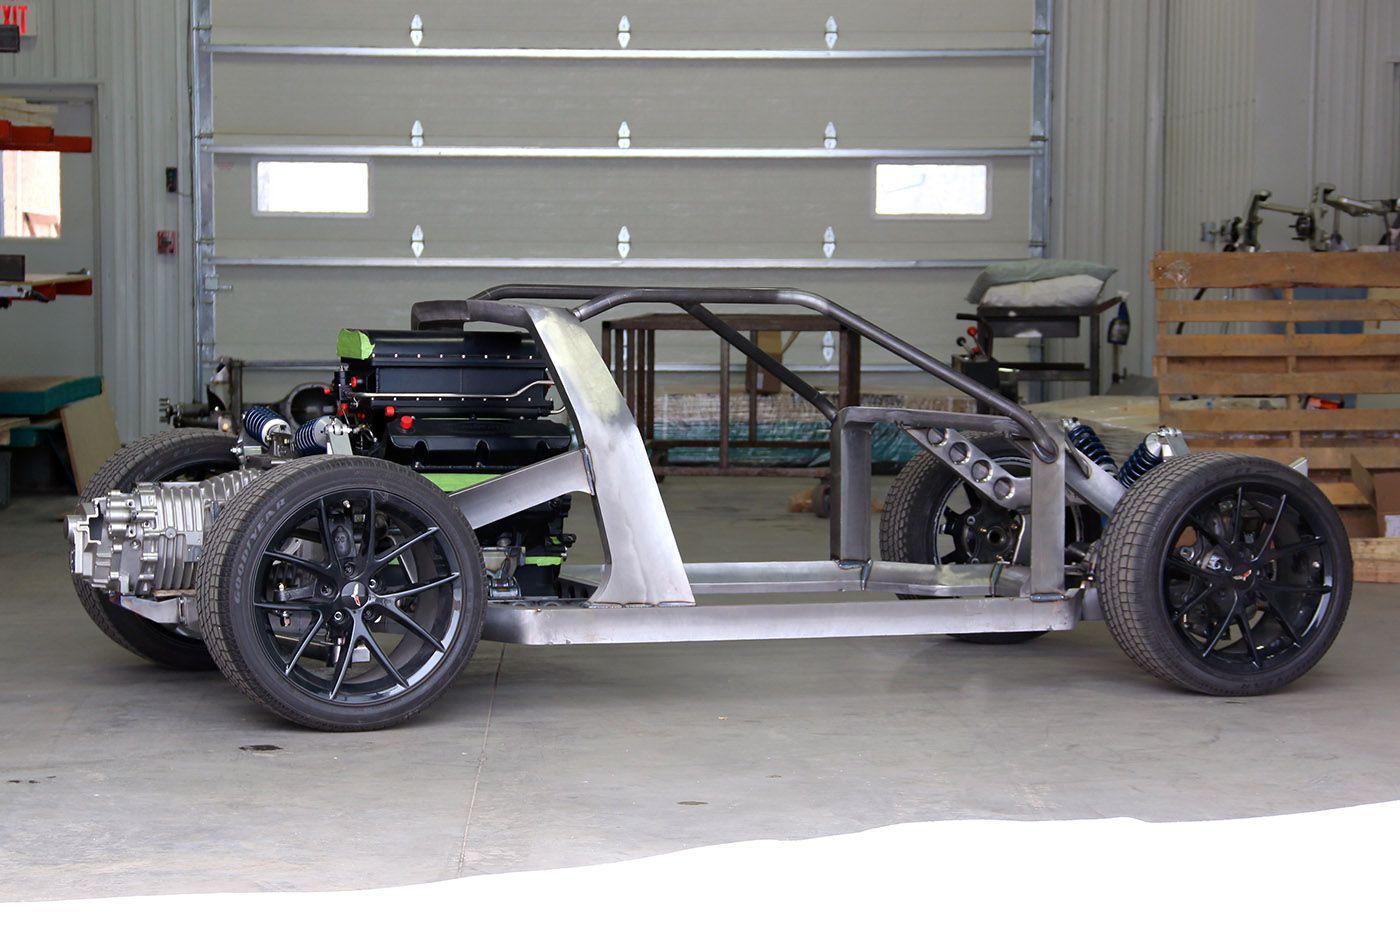 Building a Pantera with a Twin-turbo 428 Windsor | Cars, Bikes and on long bed cart, convertible cart, bar stool cart, 4x4 cart, f1 cart,